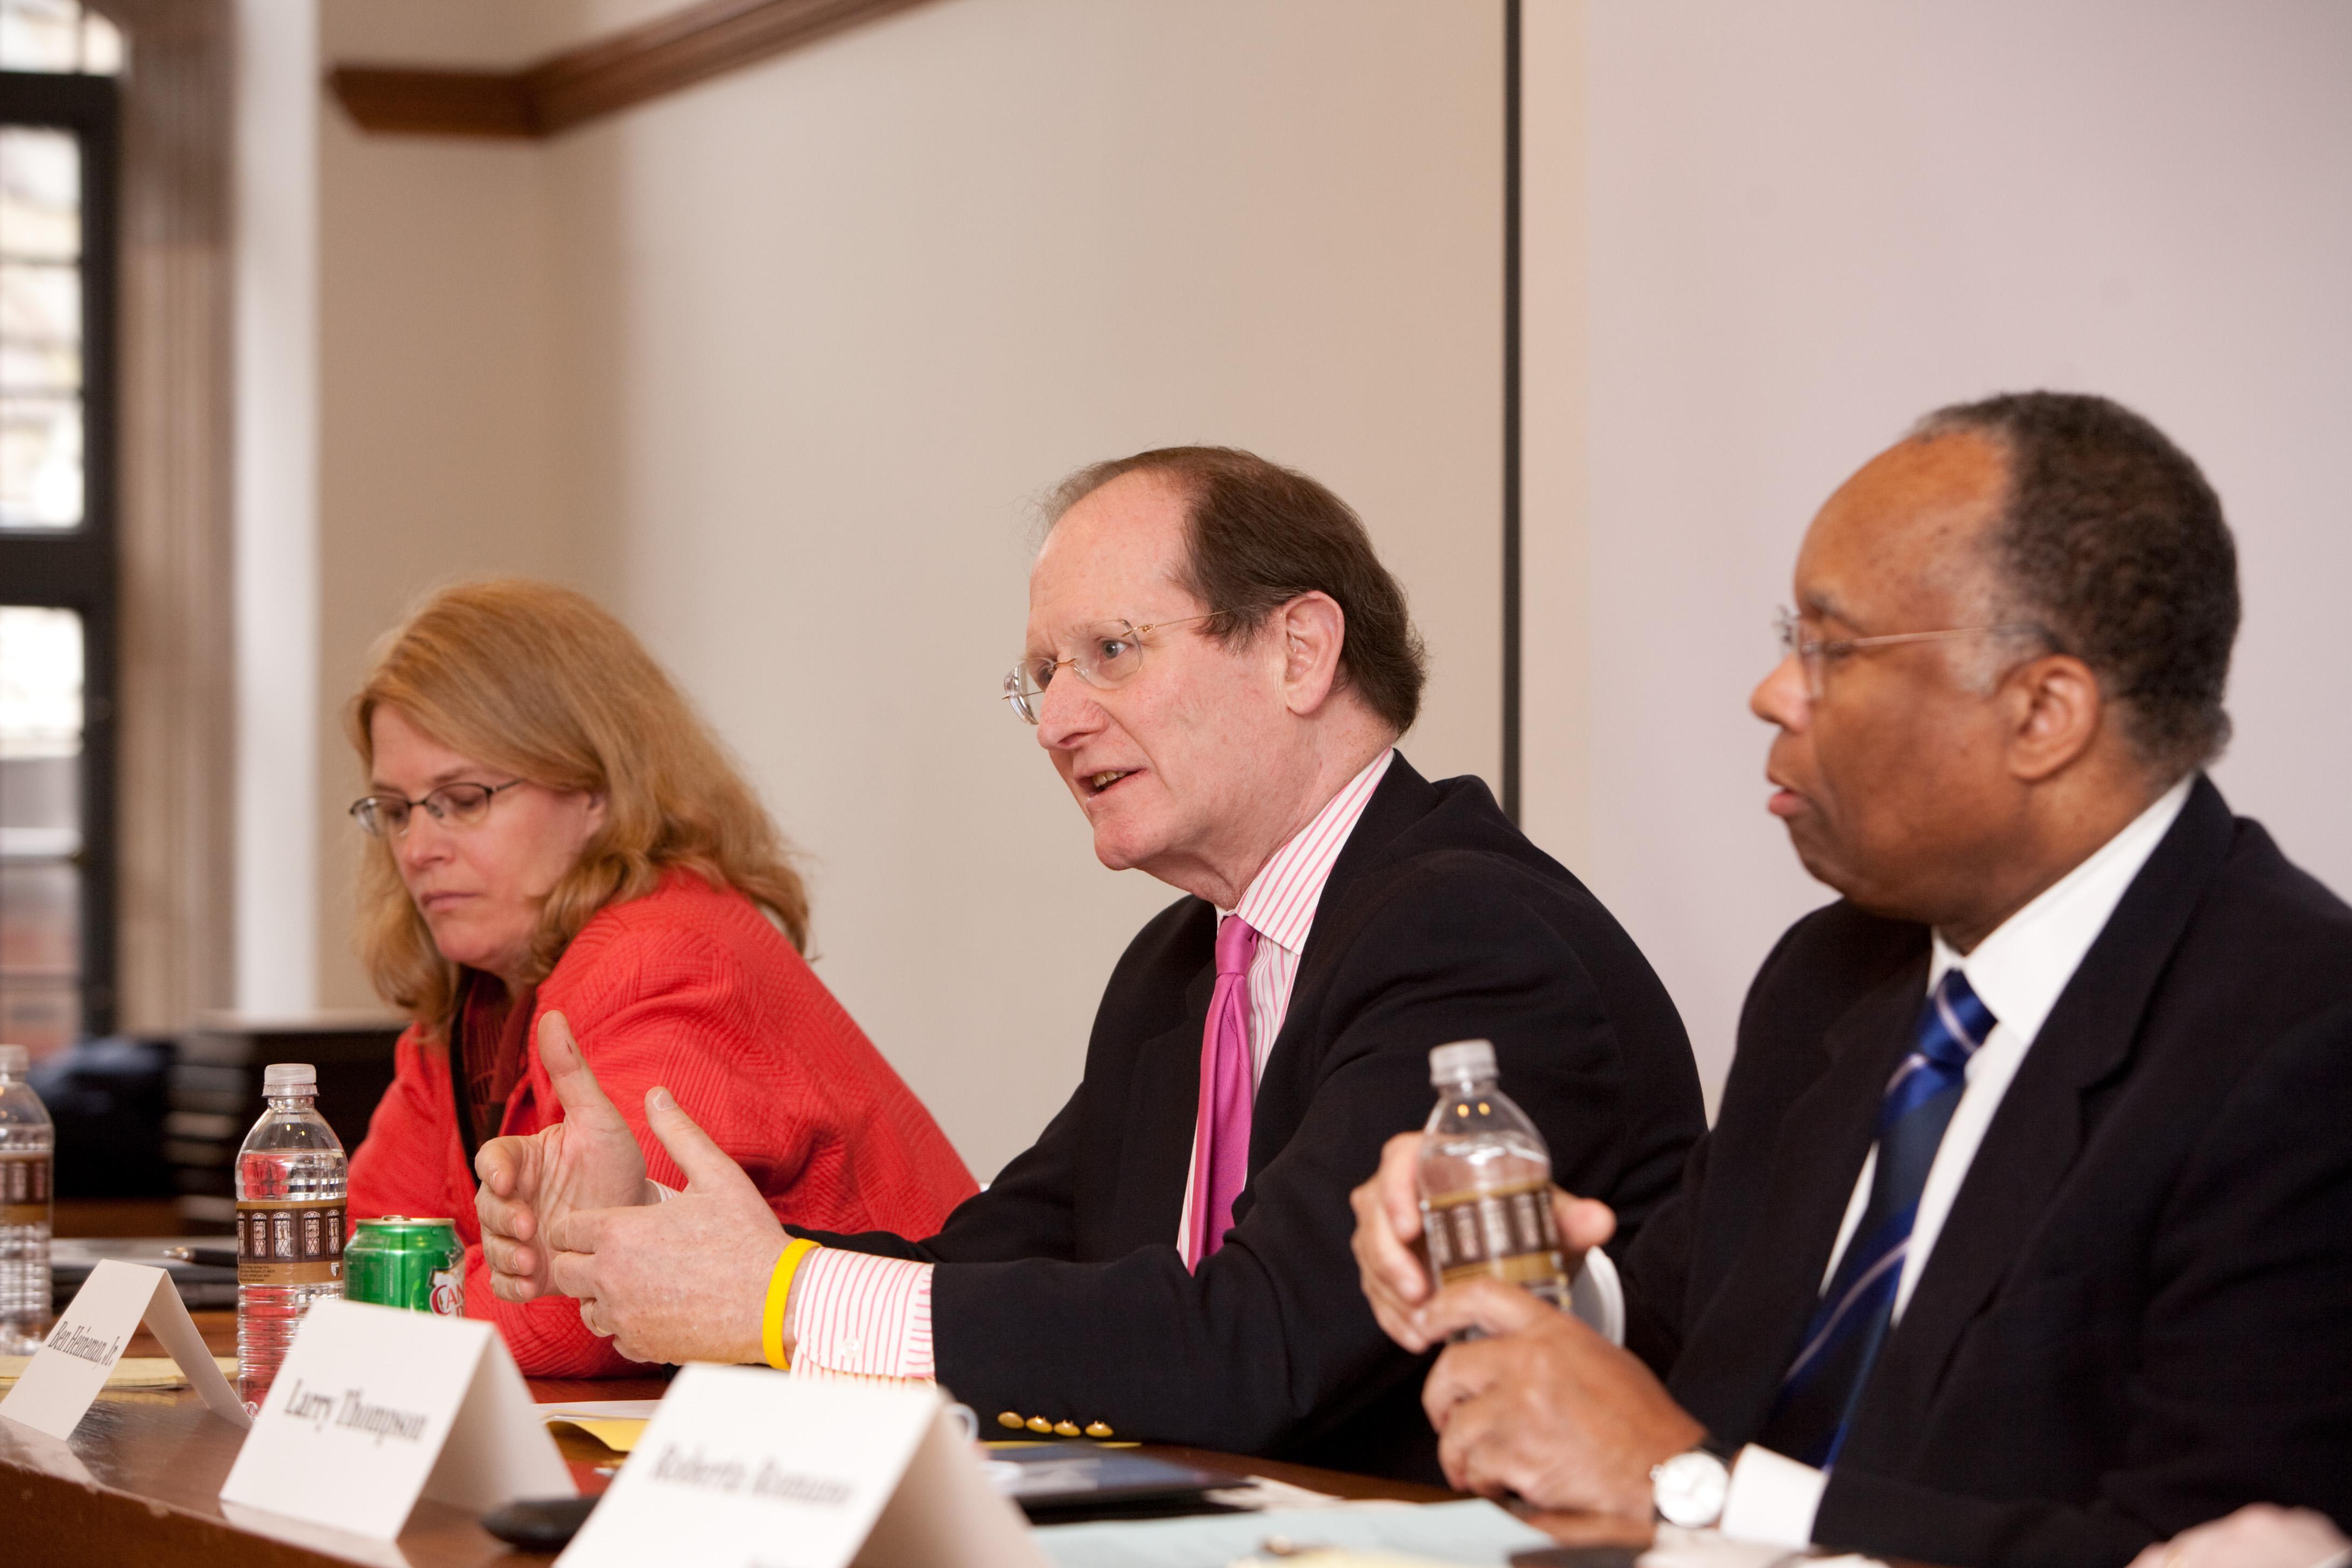 NYU Law Prof. Jennifer Arlen, Ben Heineman '71, and Larry Thompson